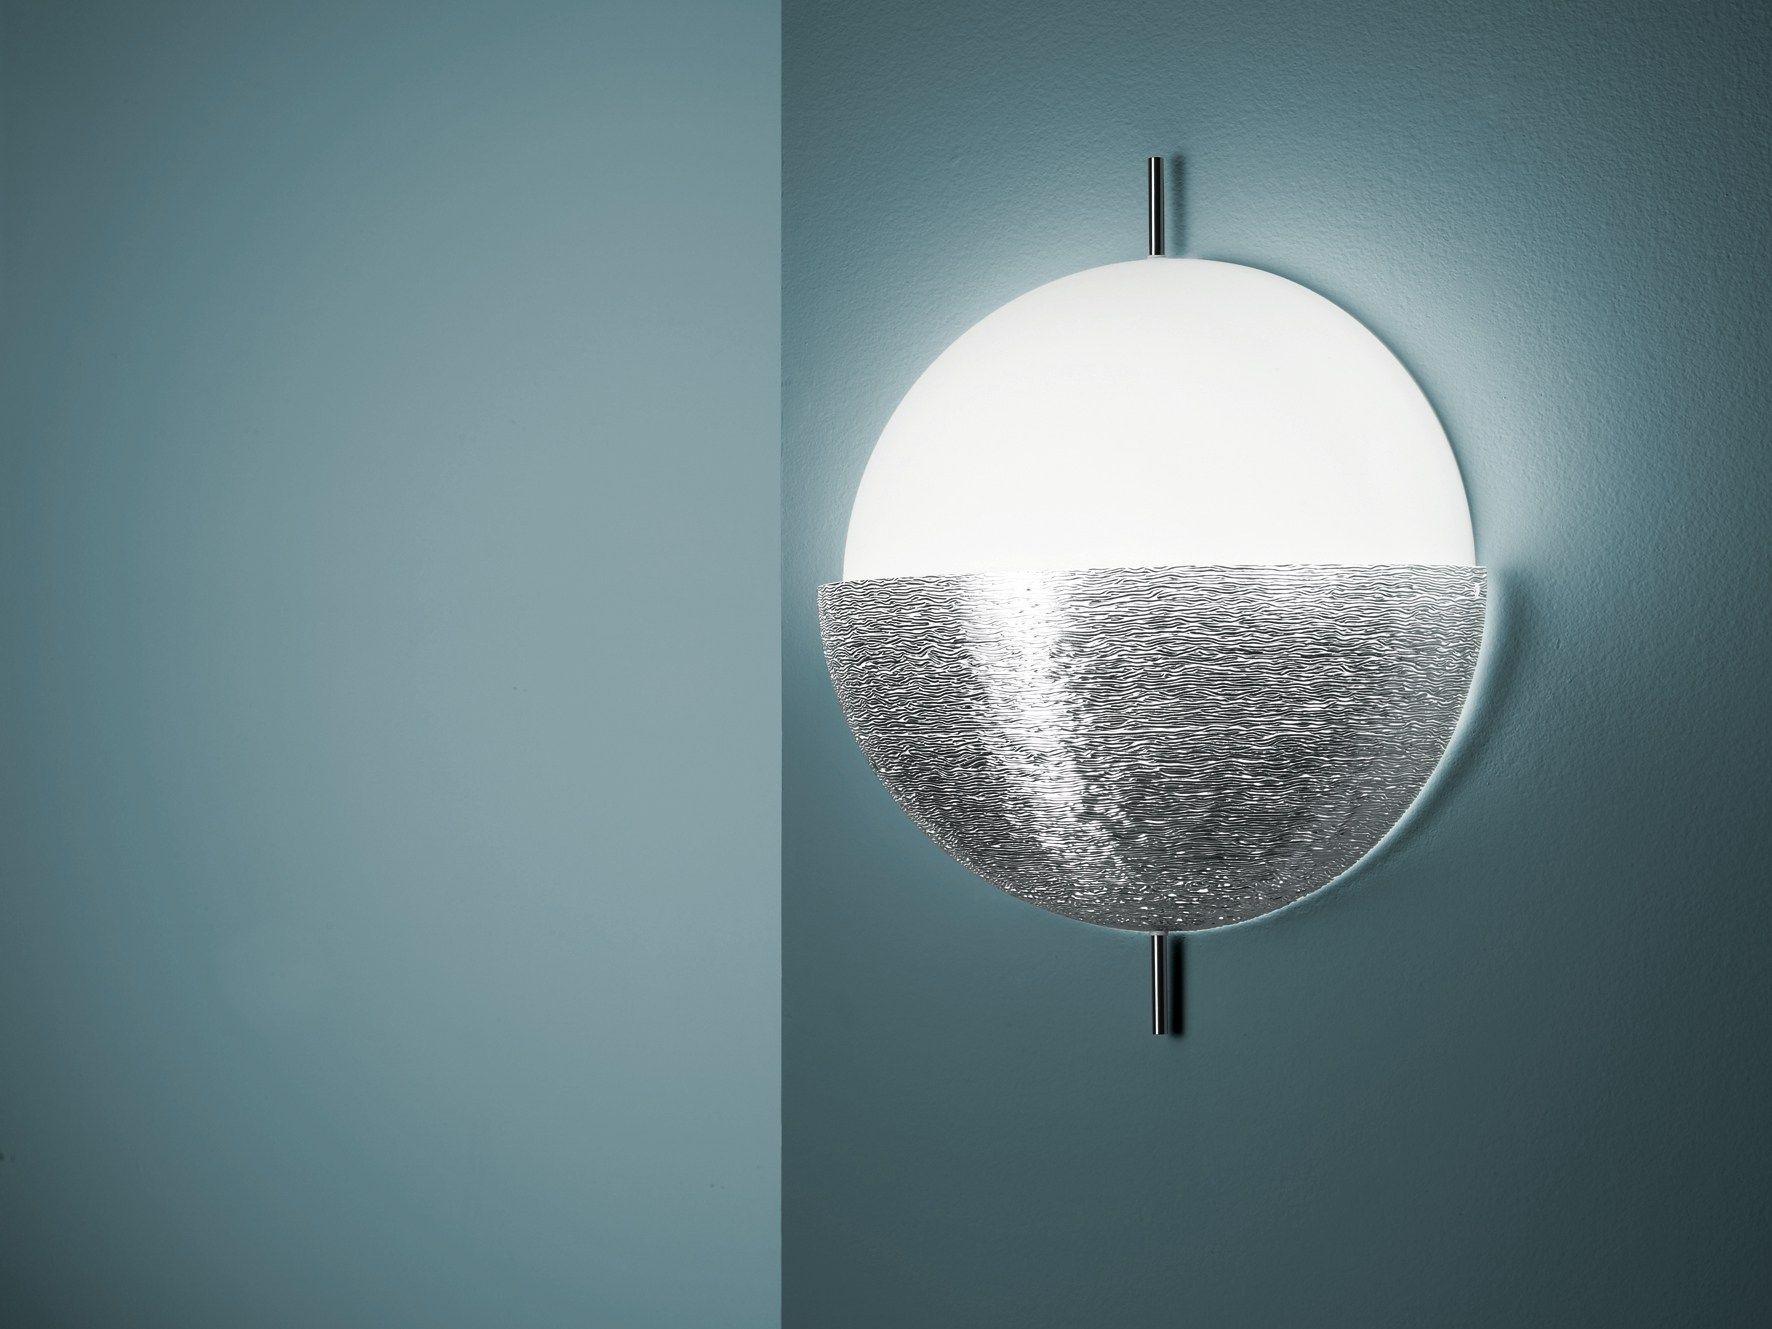 applique murale en verre souffl collection chignon by fontanaarte design piero russi. Black Bedroom Furniture Sets. Home Design Ideas